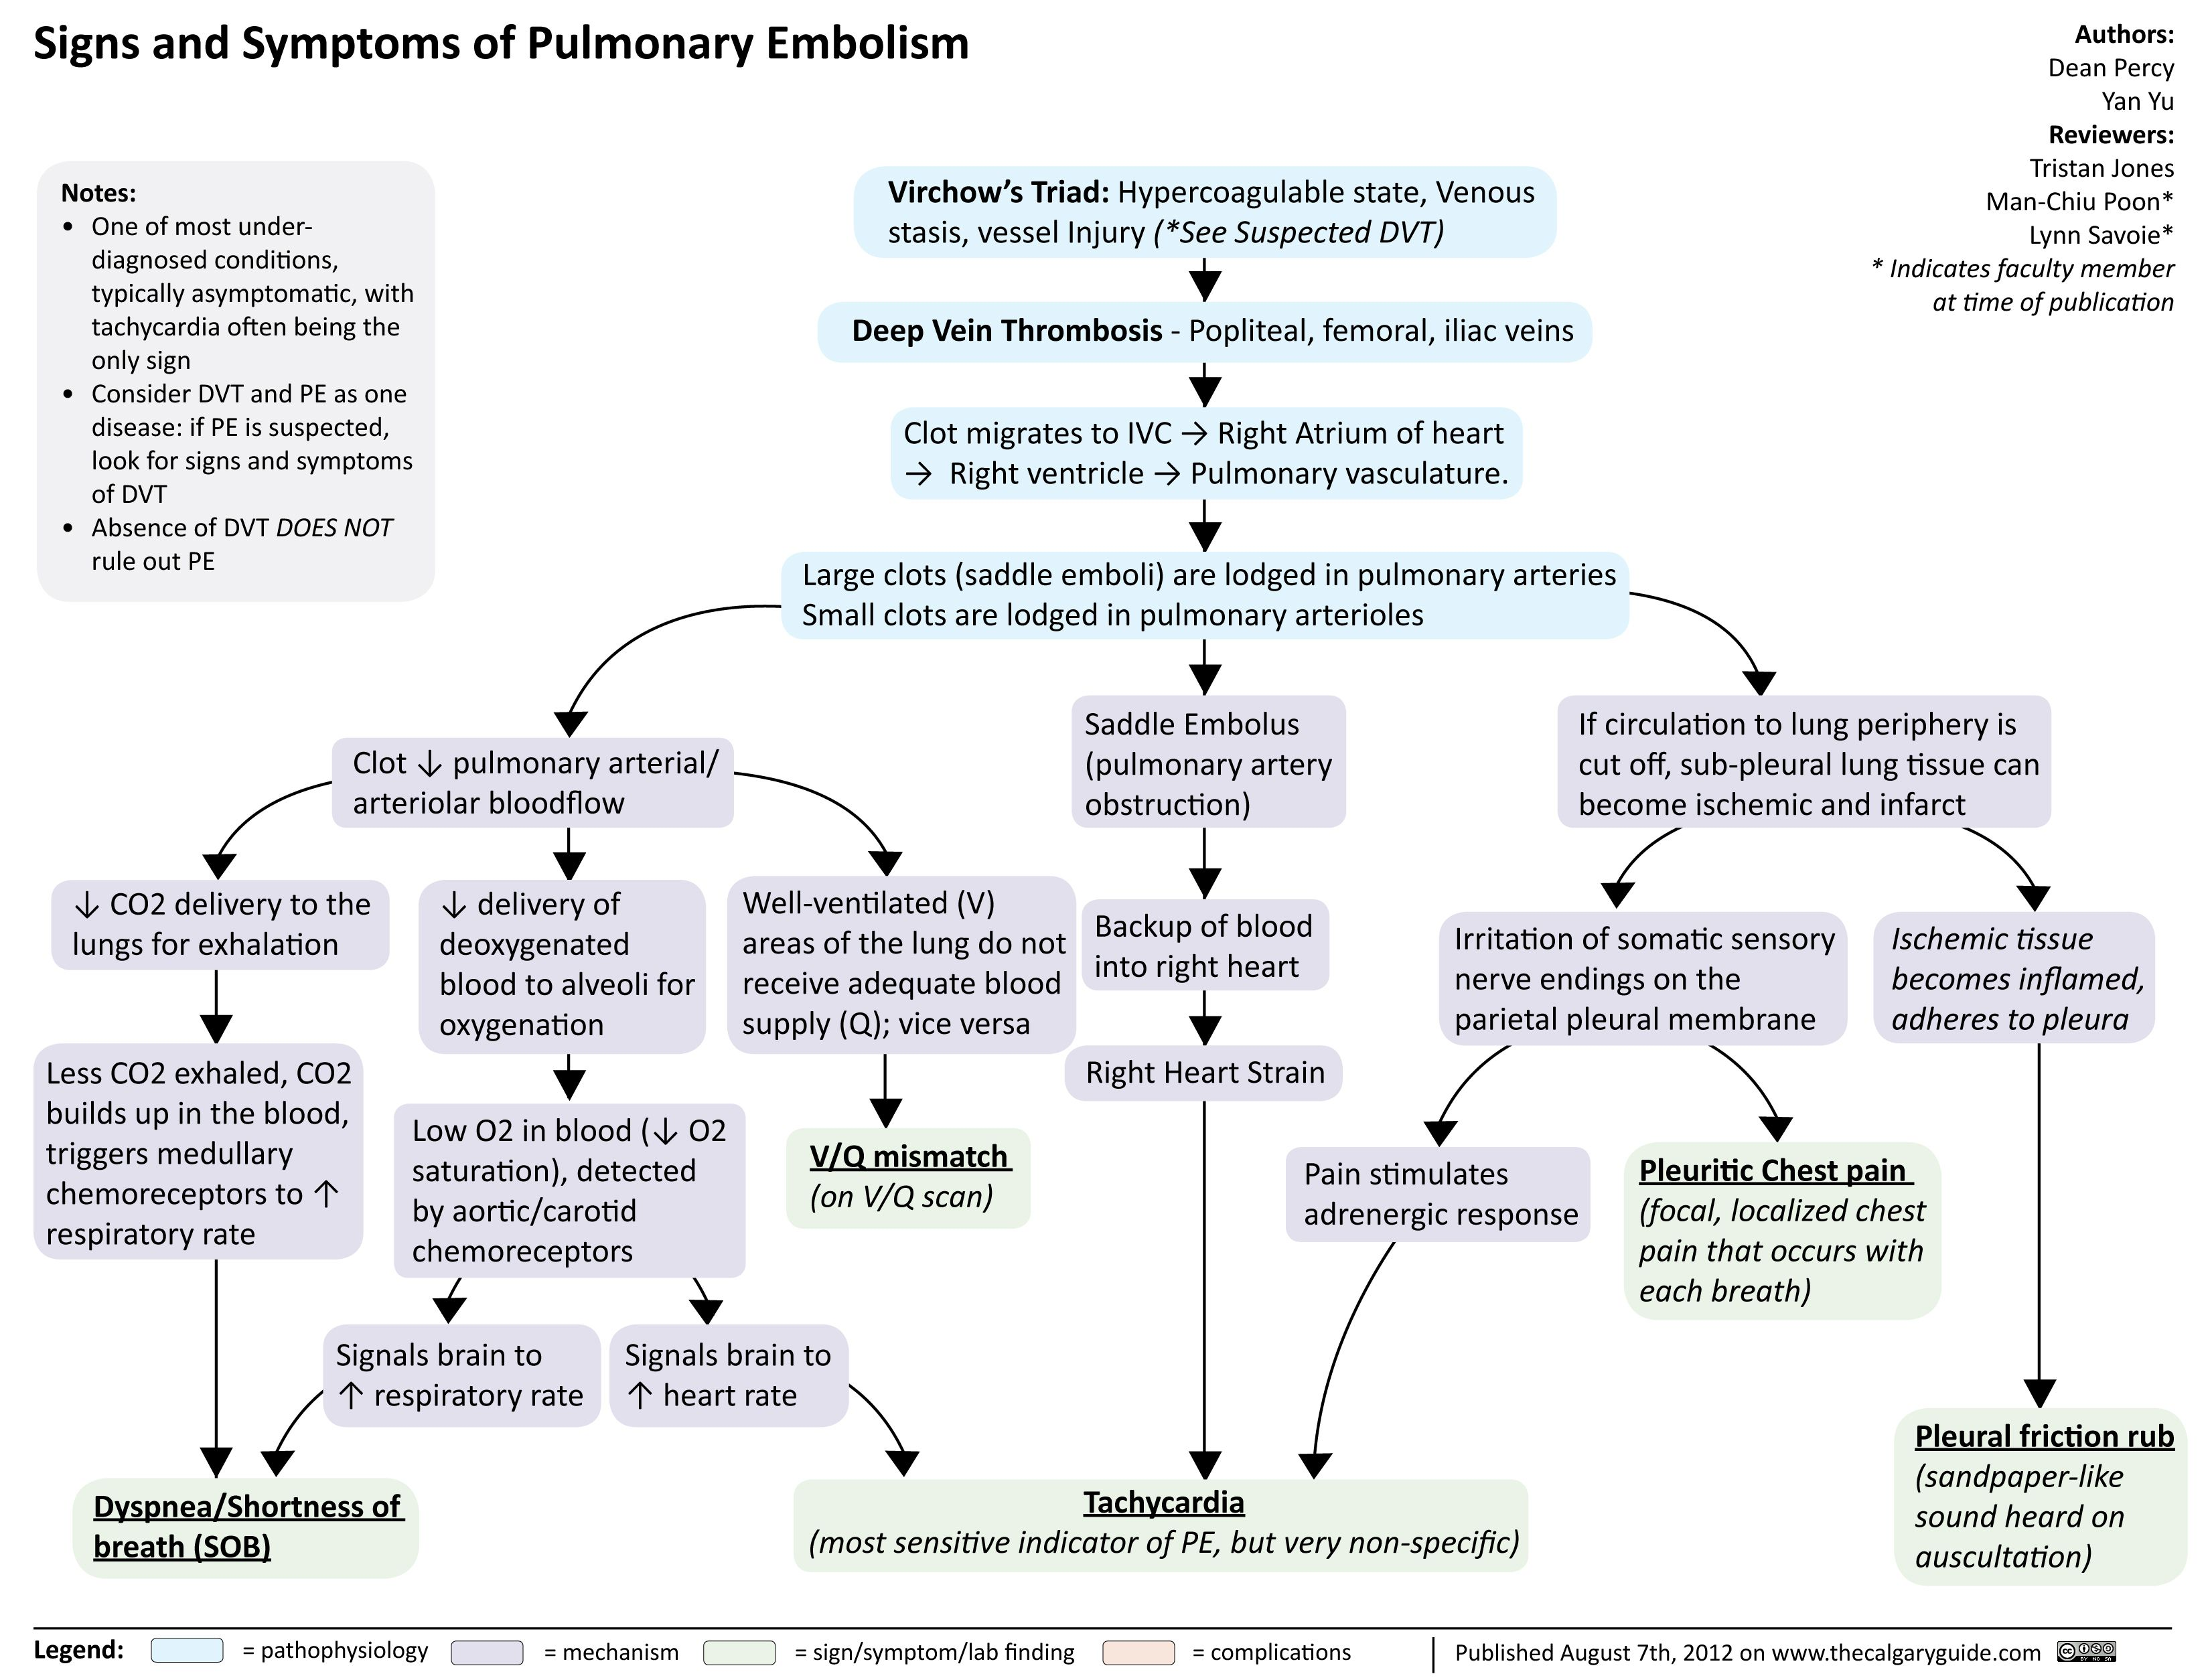 Pulmonary Embolism Signs And Symptoms